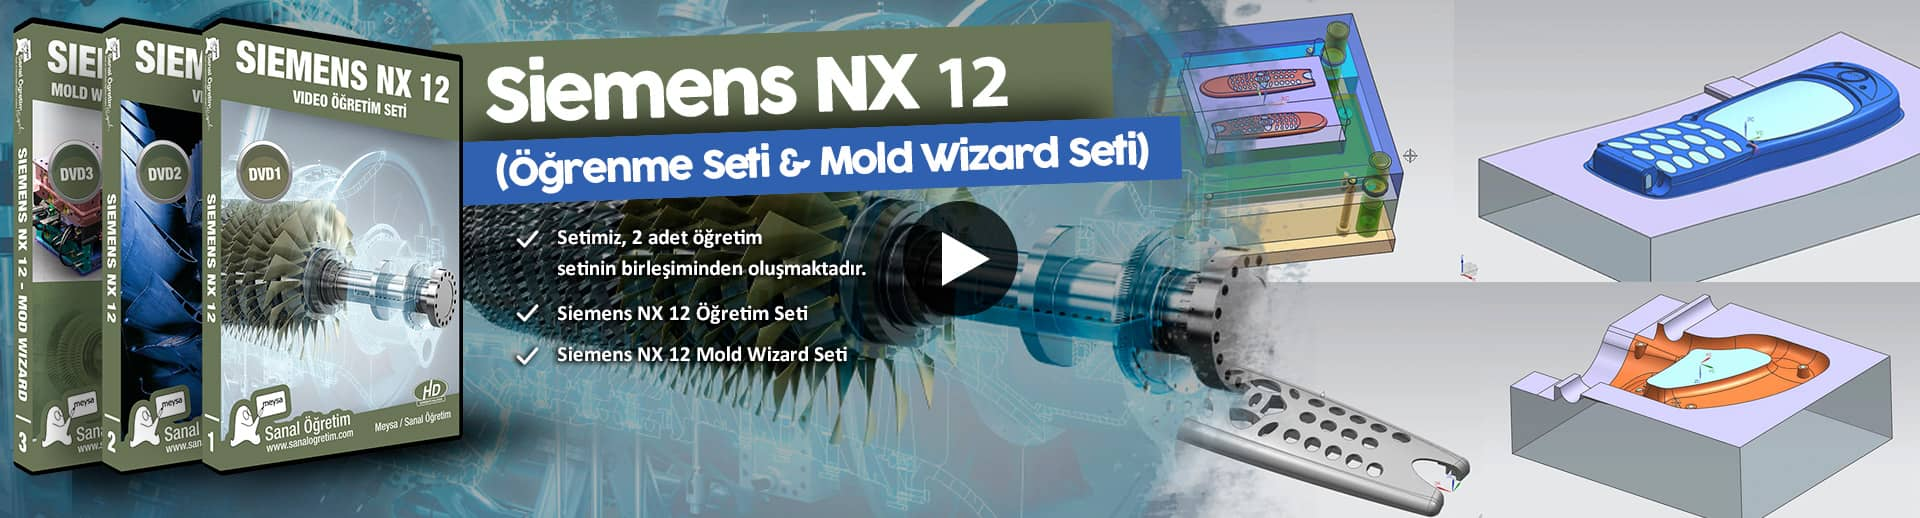 Siemens Nx 12 (Öğrenme Seti & Mold Wizard Seti) | Sanal Öğretim